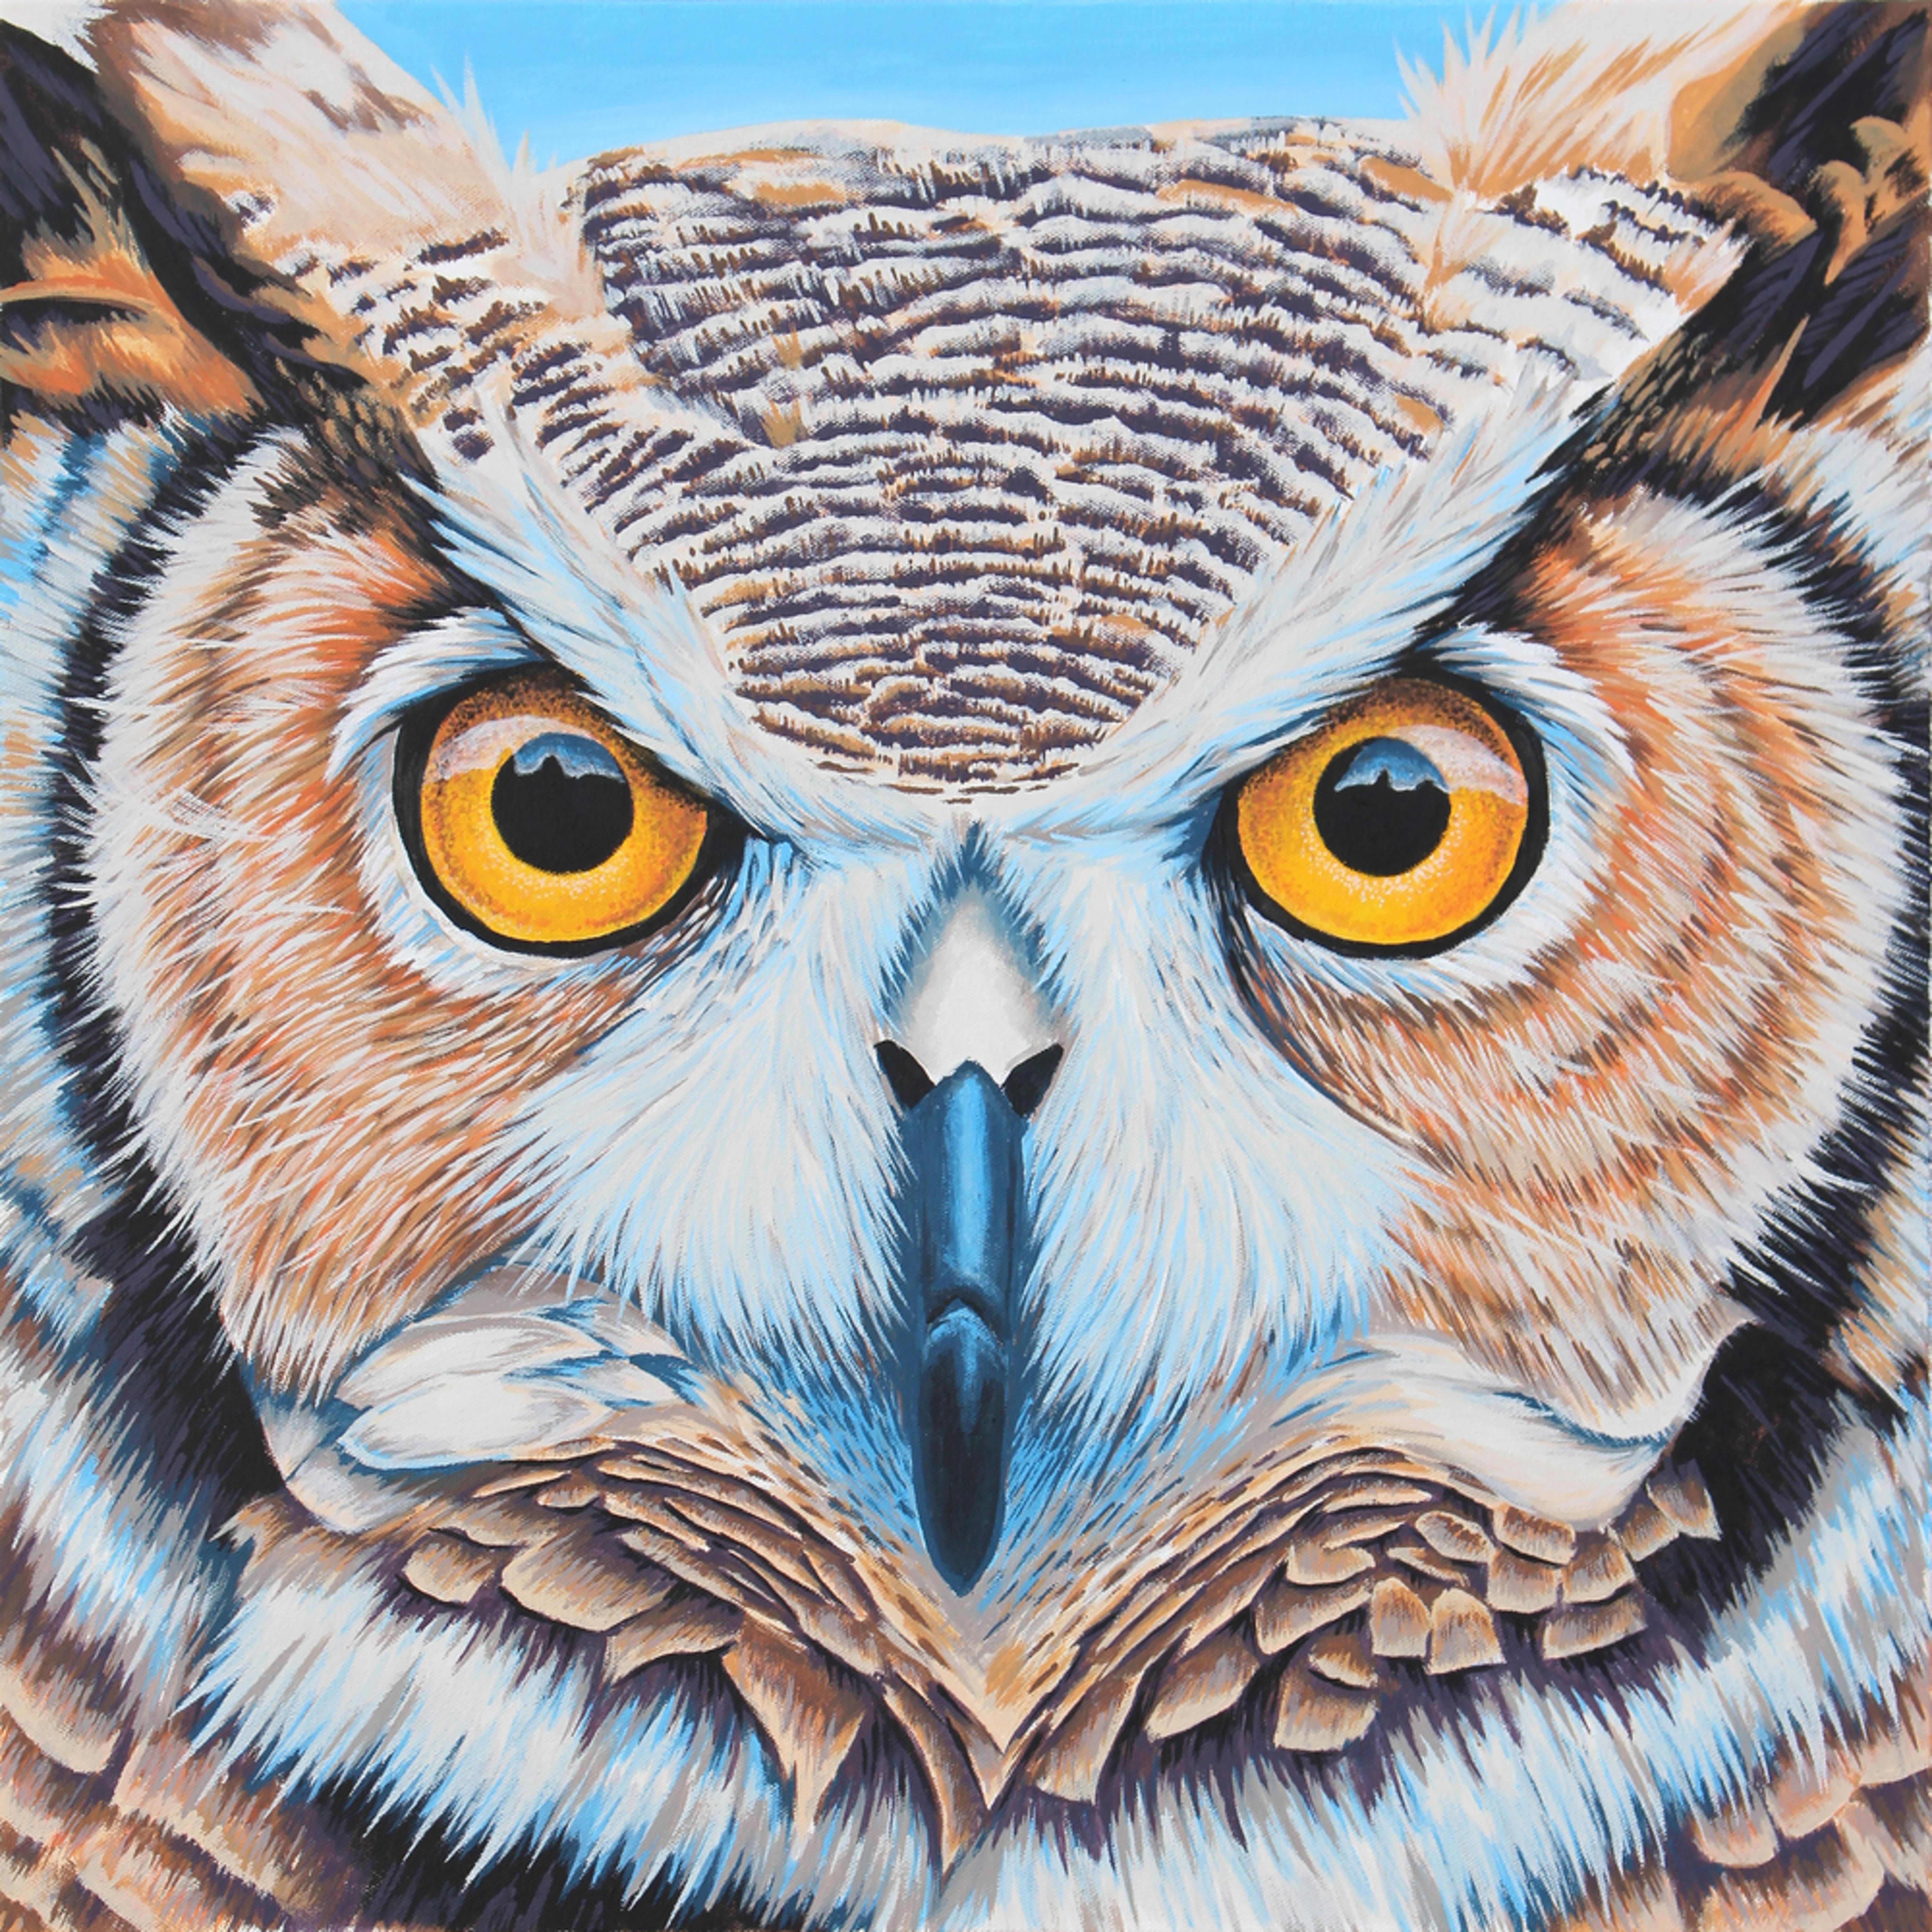 Owl large ksldrq